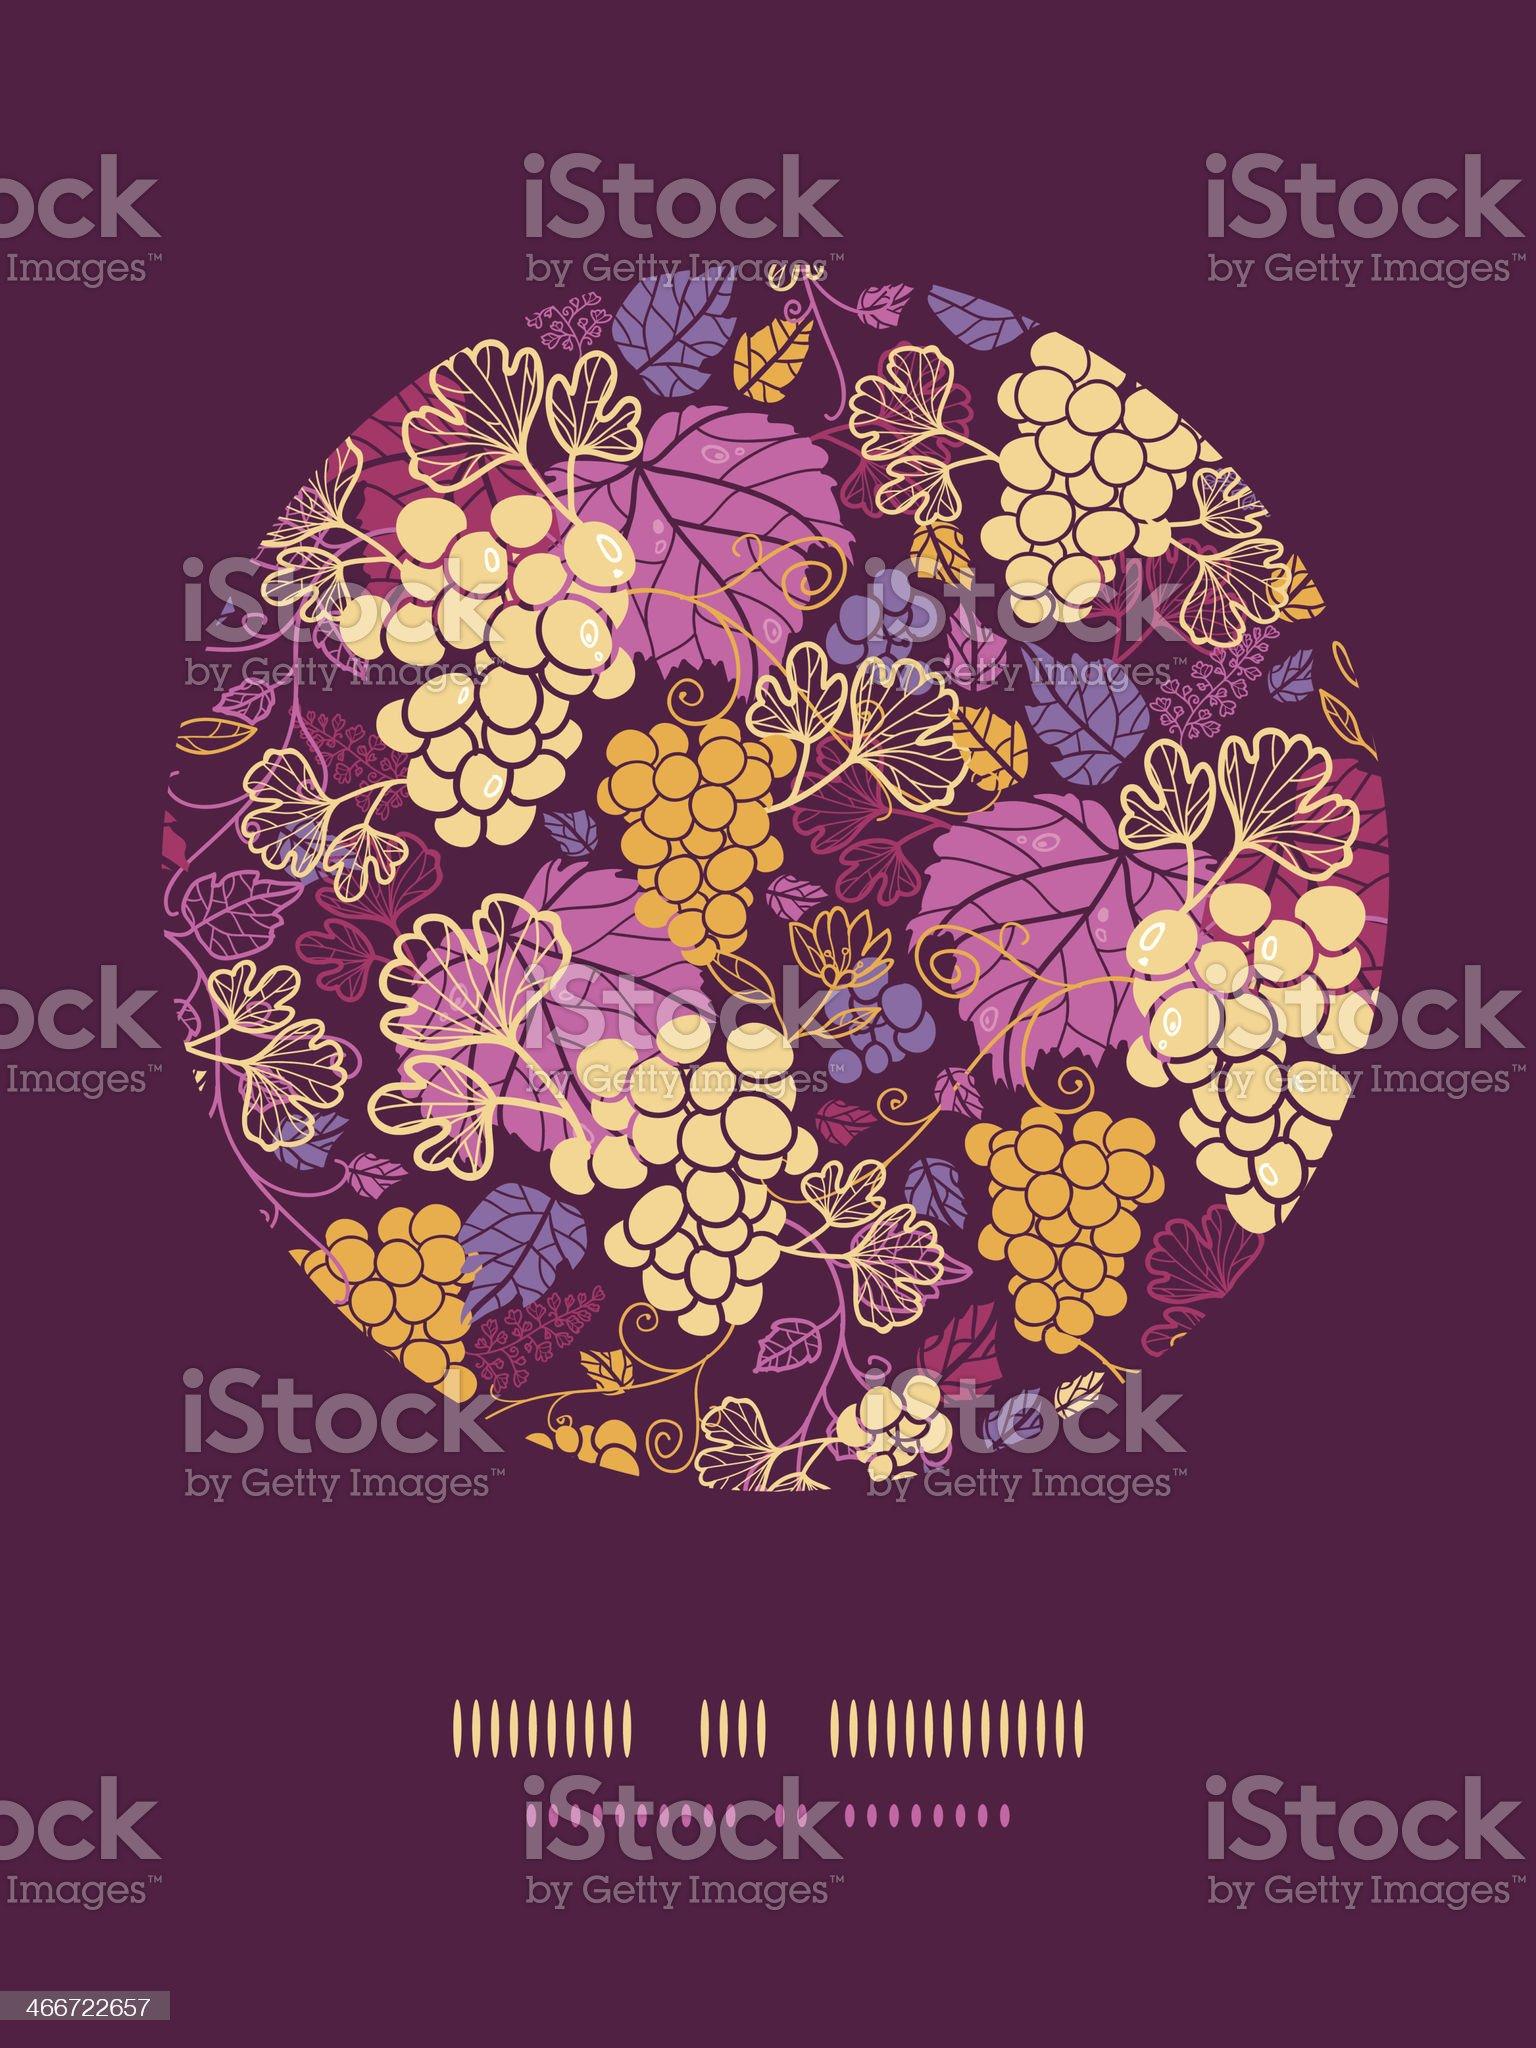 Sweet grape vines circle decor pattern background royalty-free stock vector art